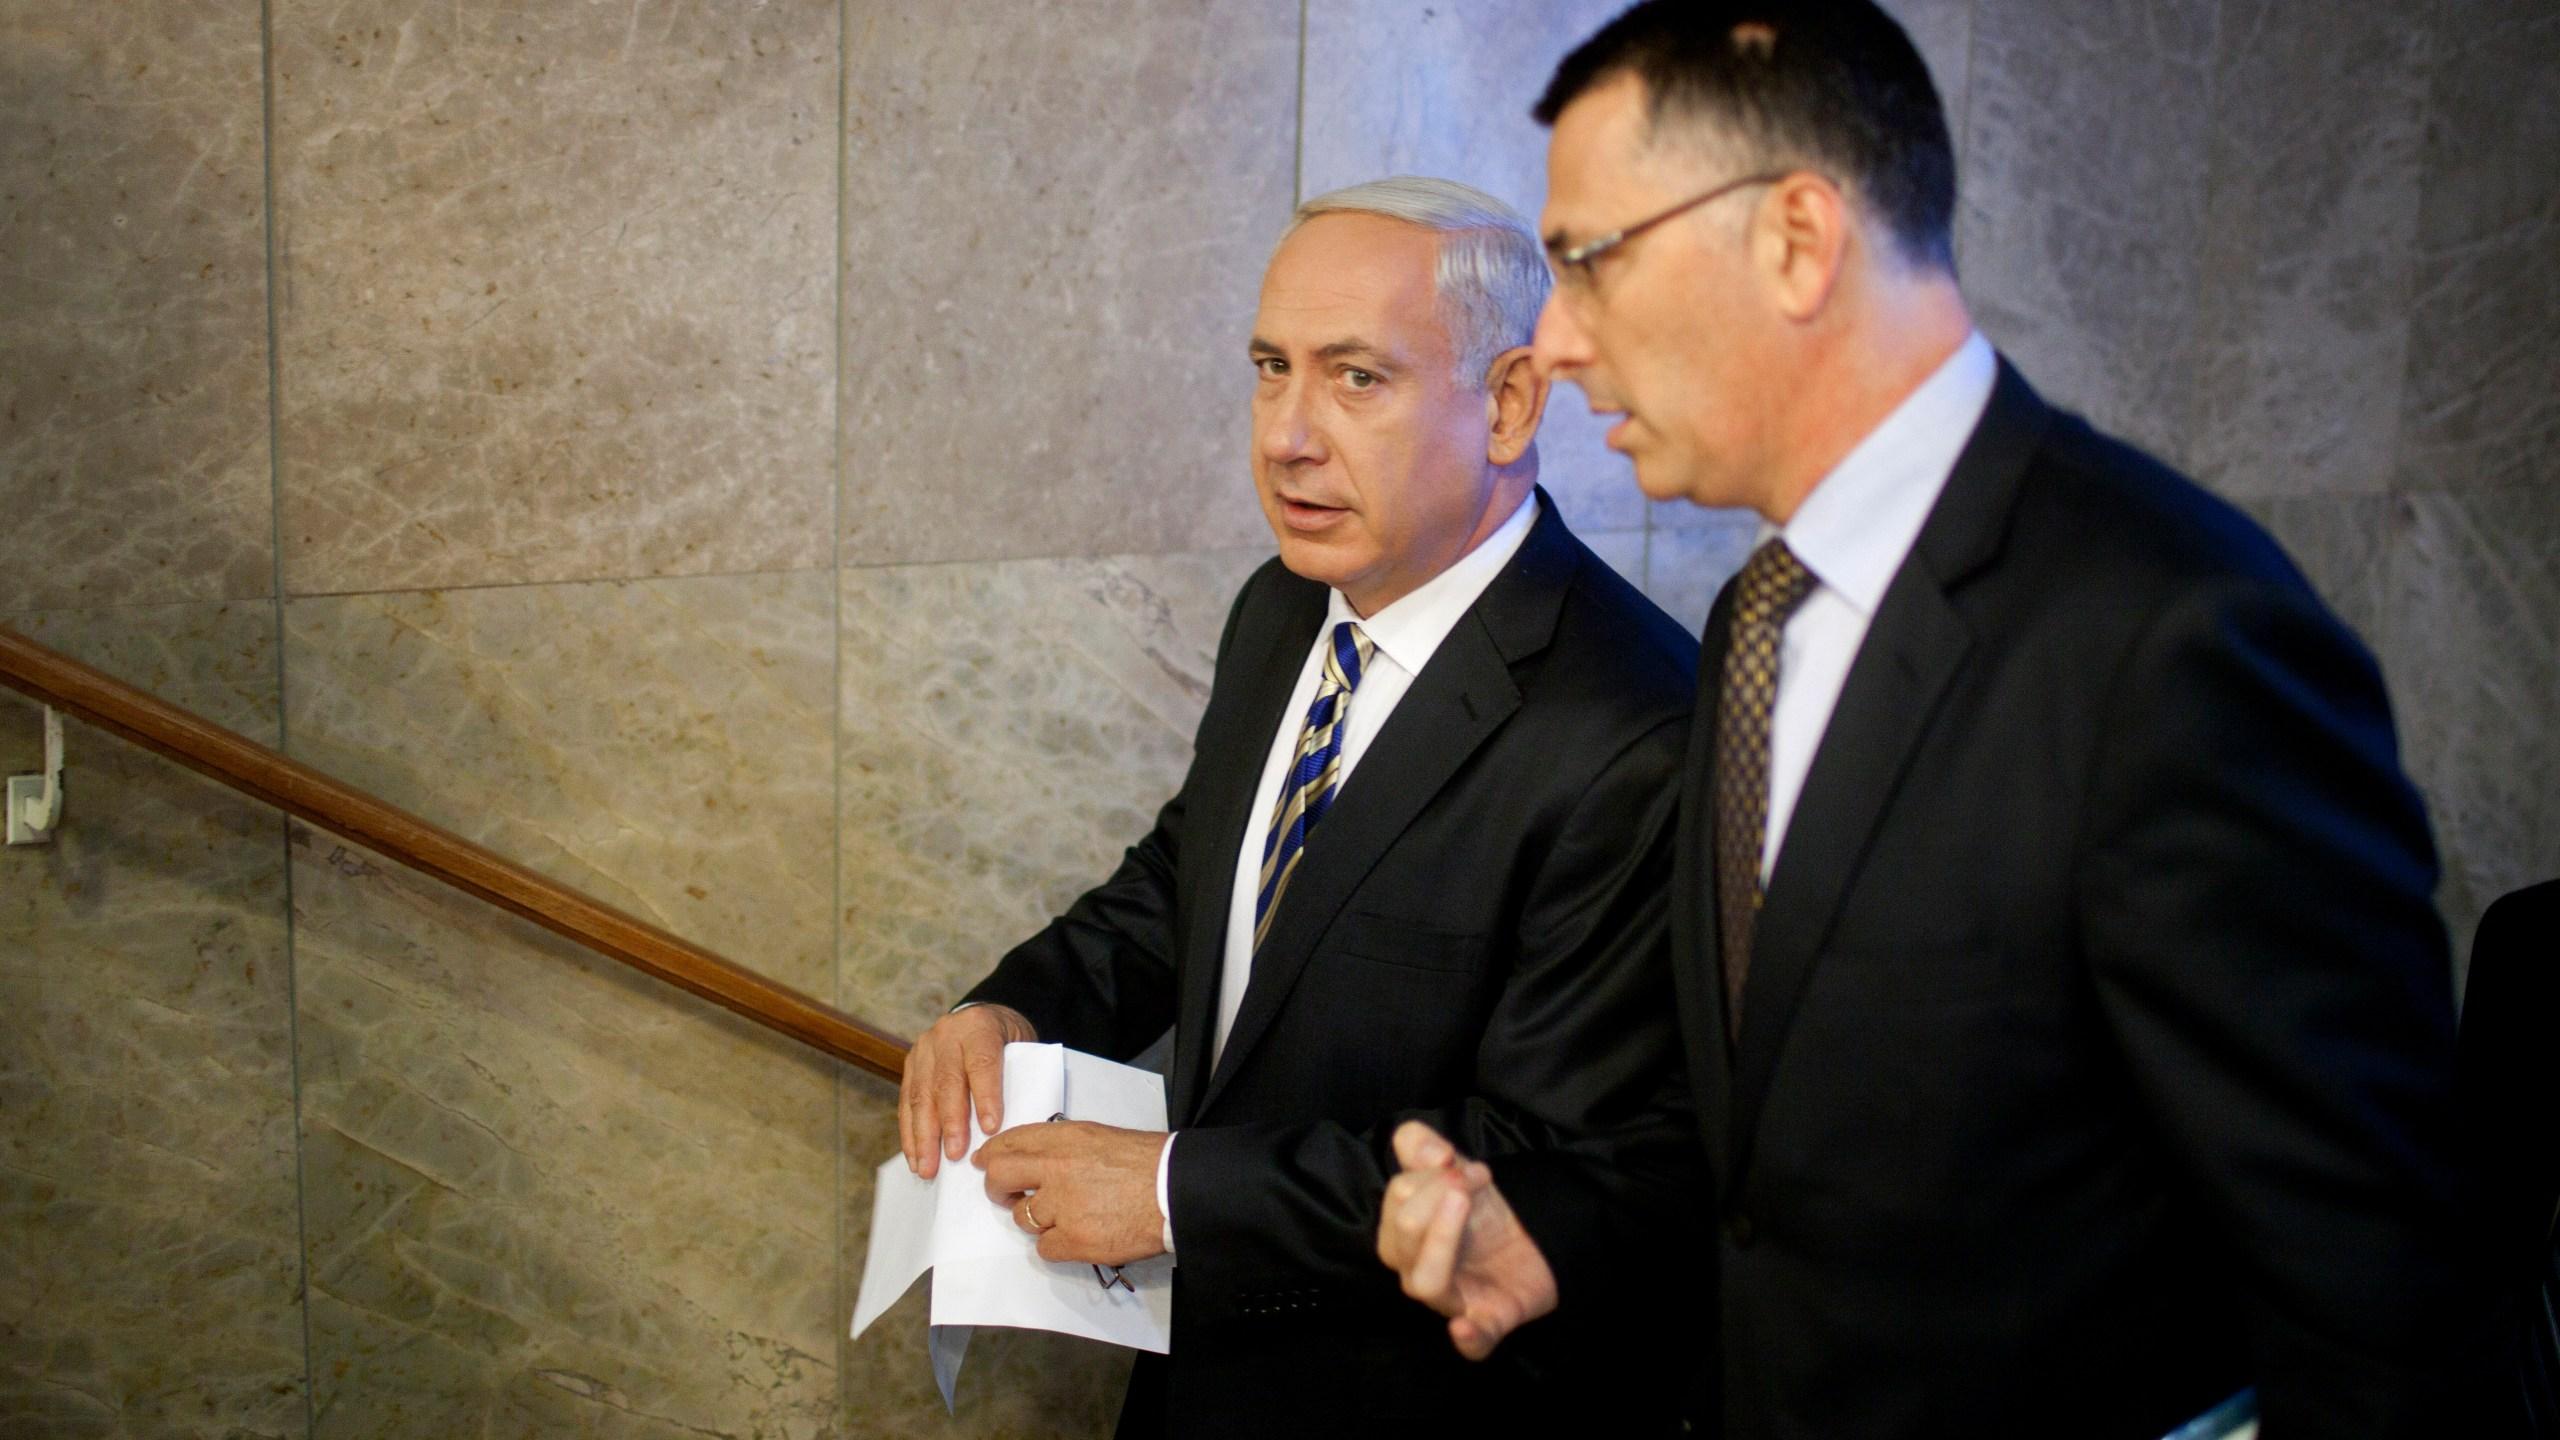 Benjamin Netanyahu, Gideon Saar